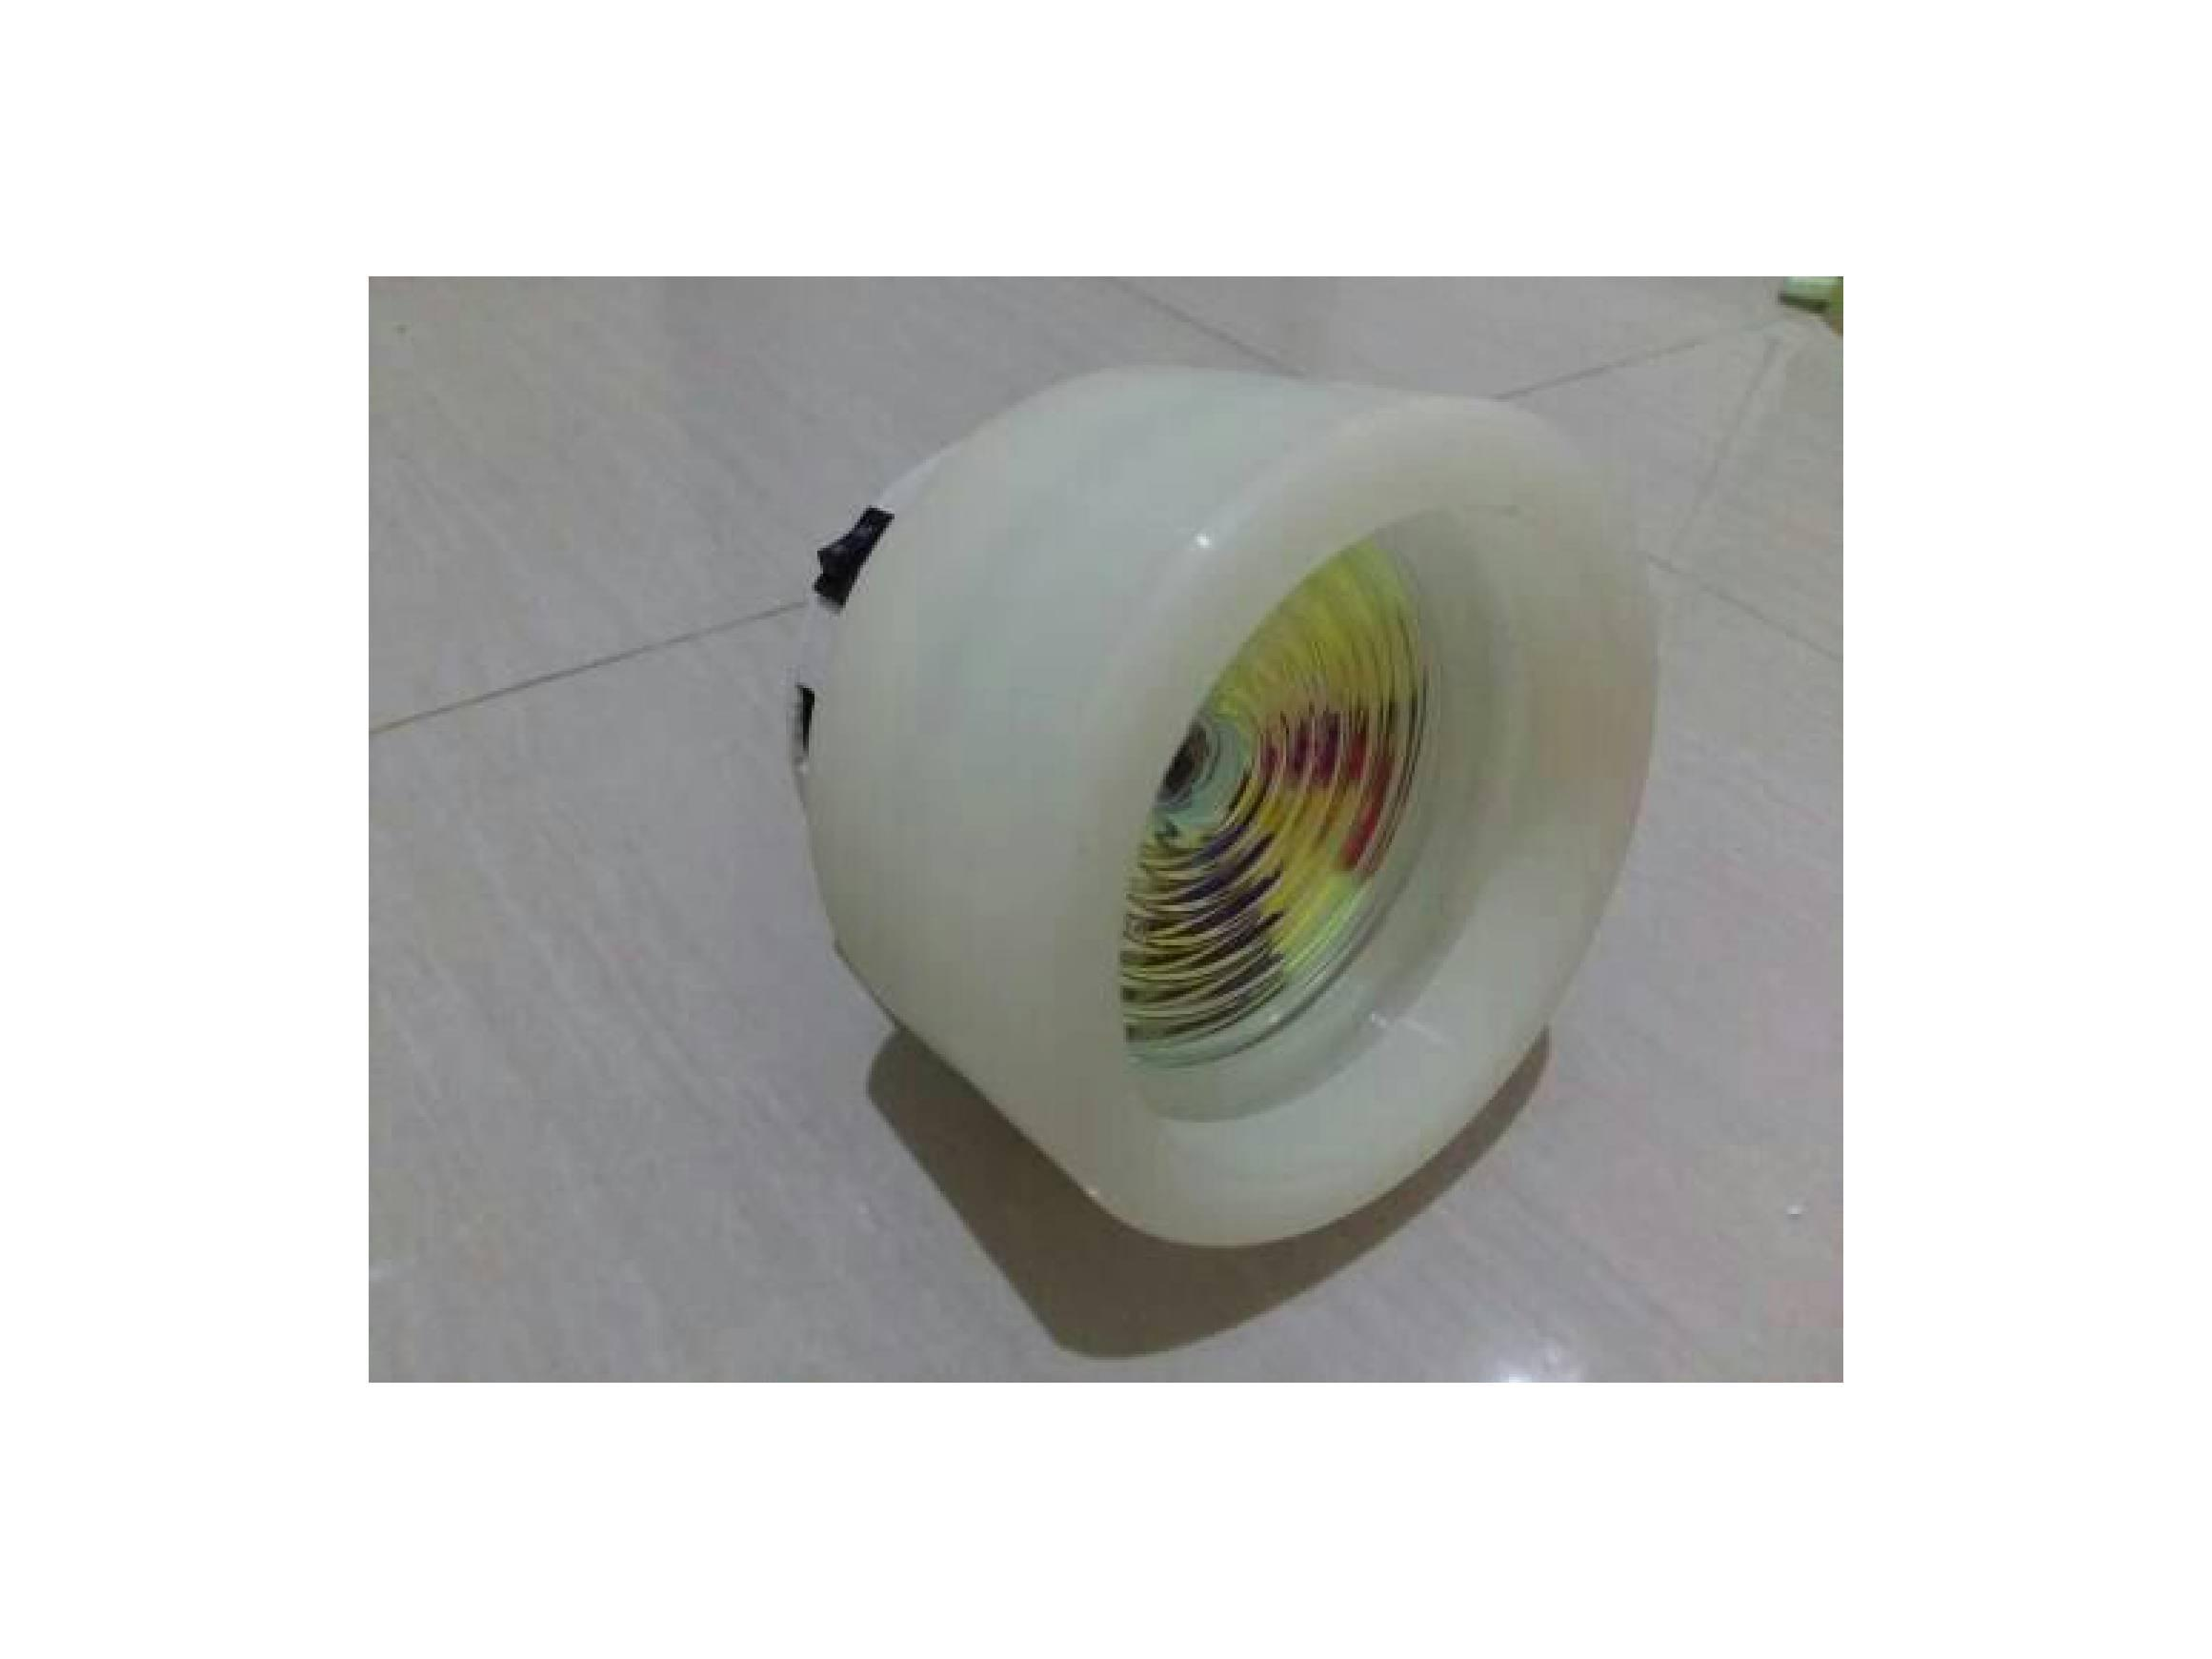 ... Memimpin Sinar UV Ultra Ungu Cahaya Hitam Cahaya Senter (Hitam) (LE625HLAA6LA5HANID-. Source · Rp 1.120.000